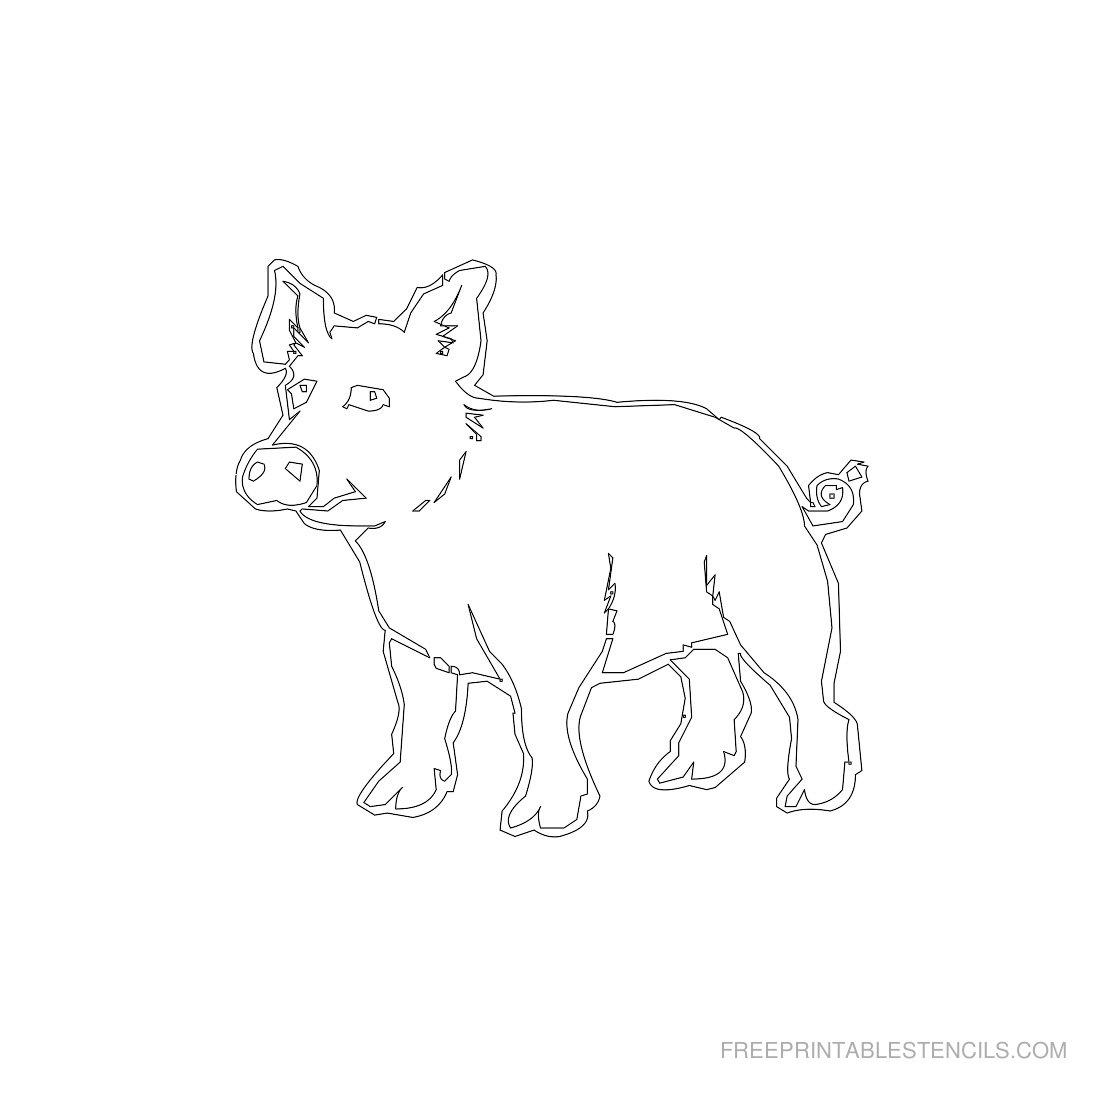 Free Printable Animal Stencil Pig